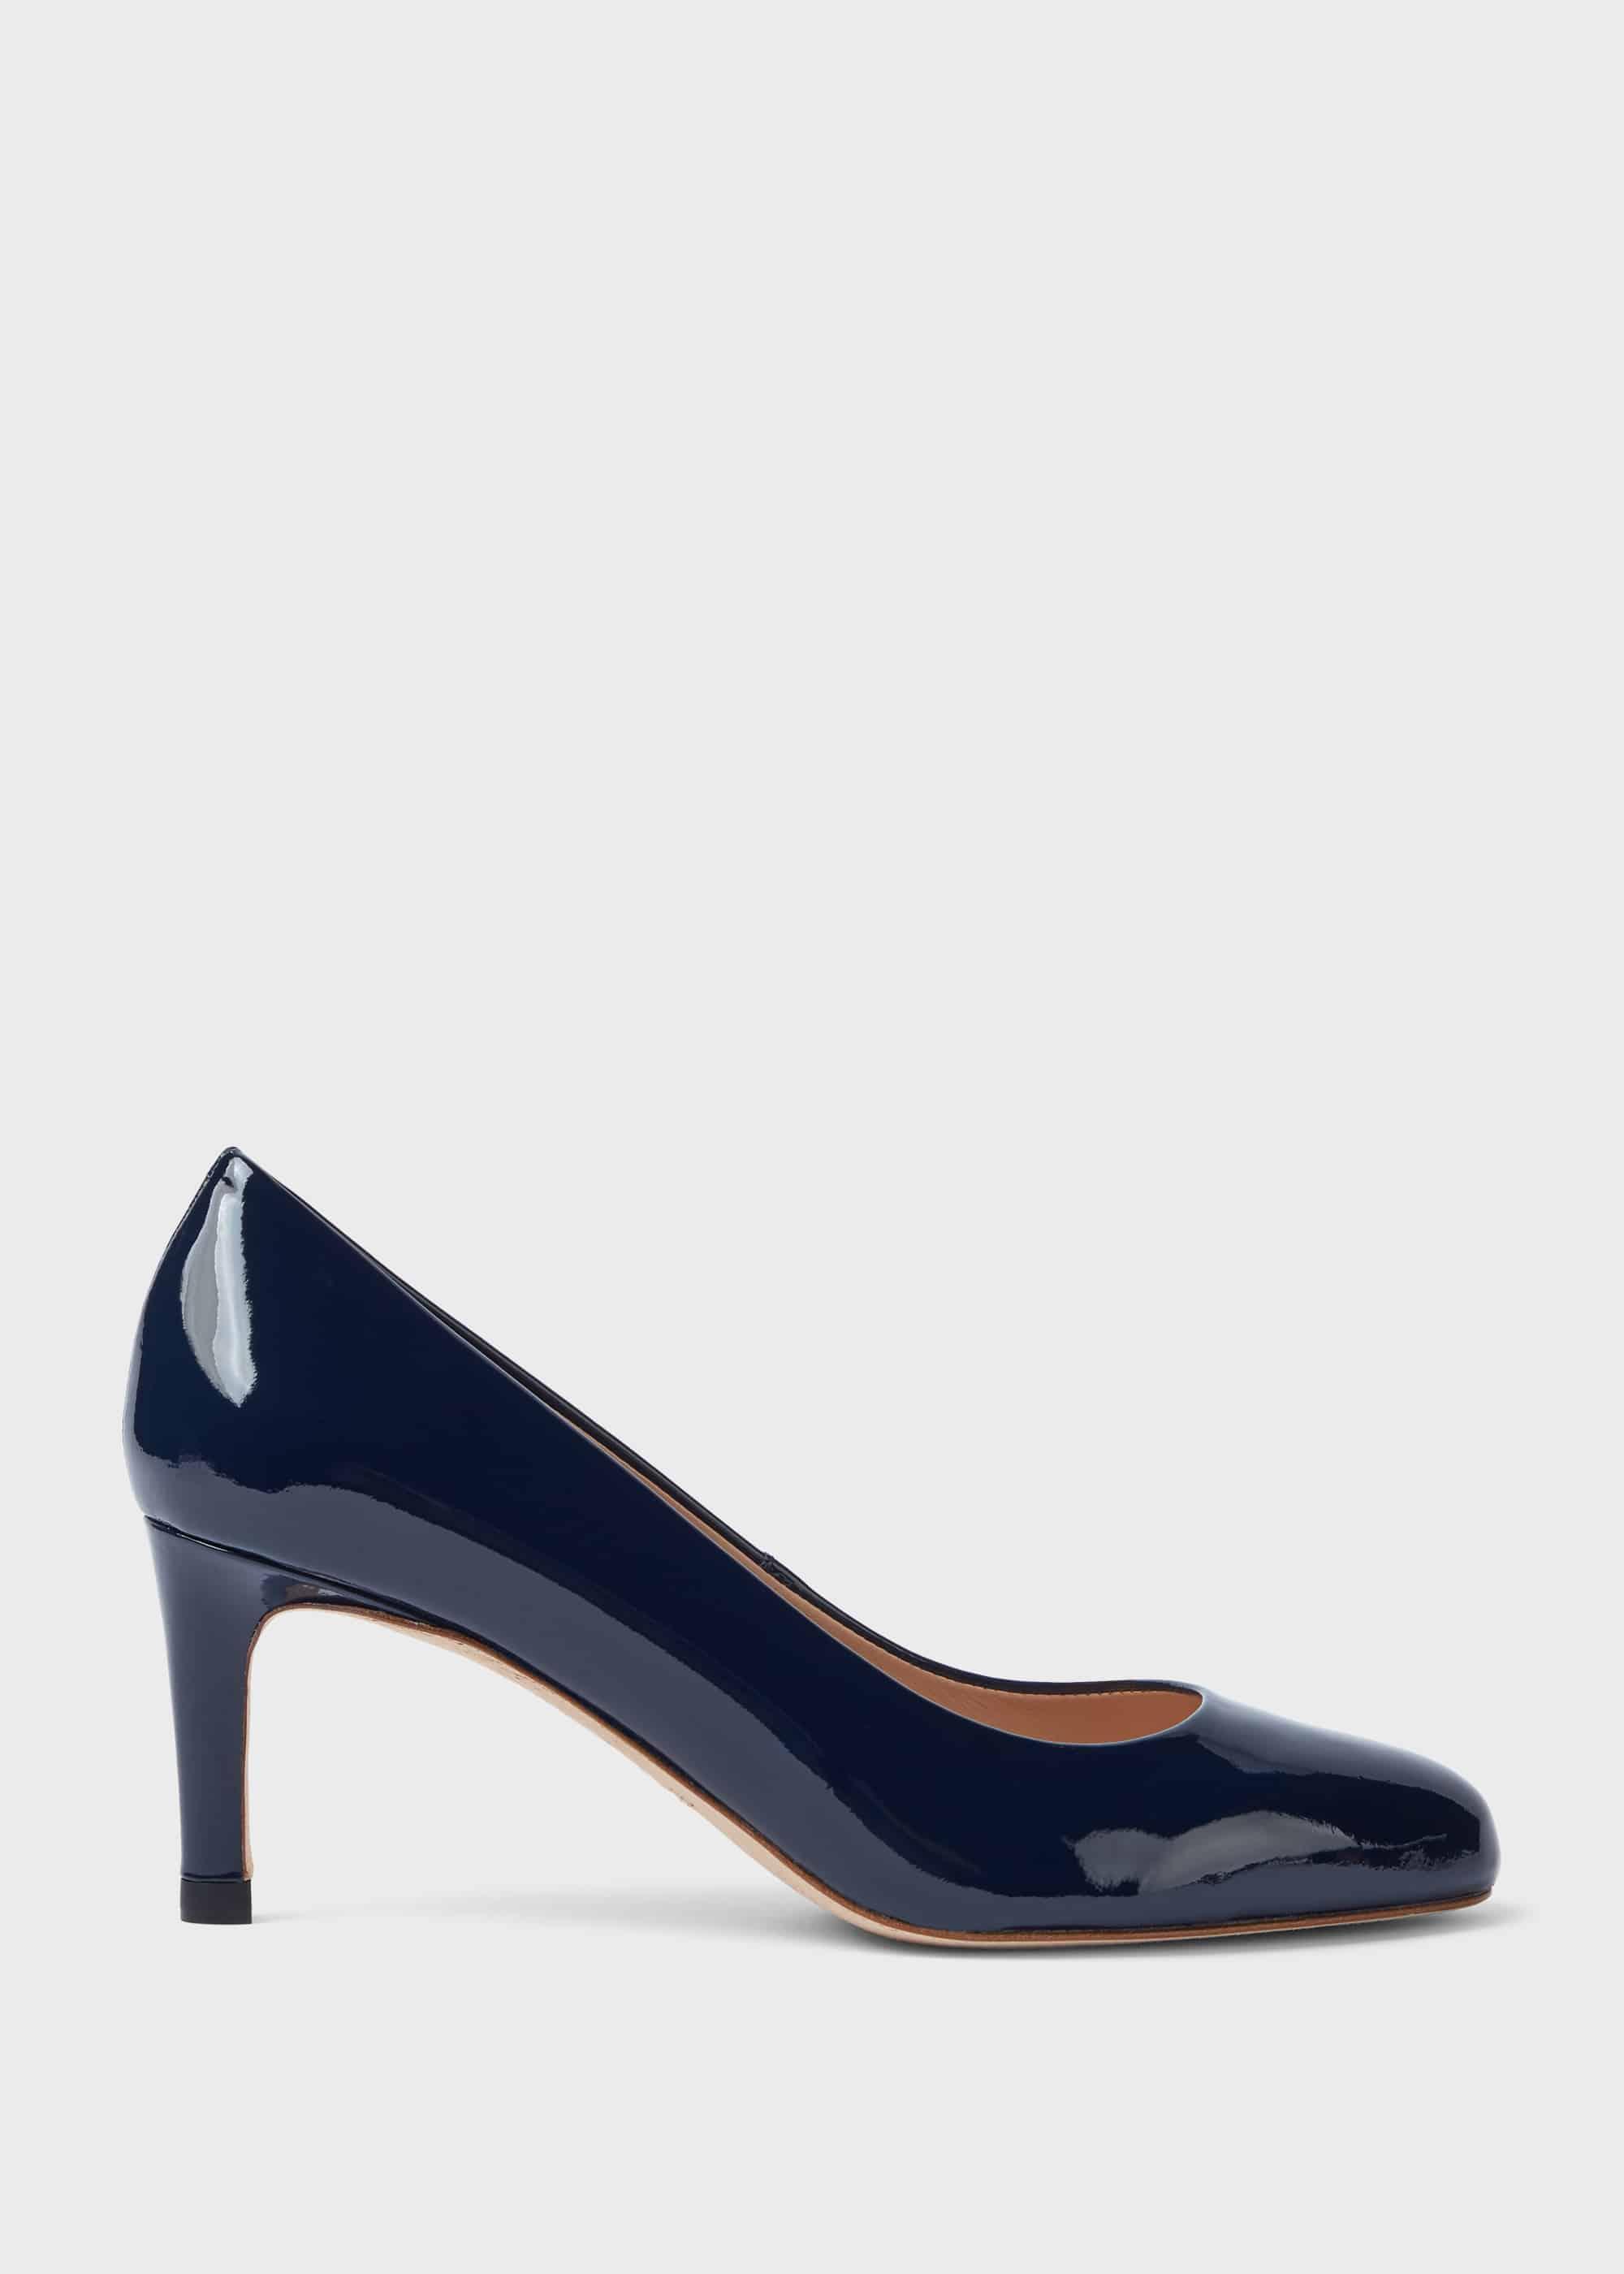 Hobbs Women Lizzie Patent Court Shoes